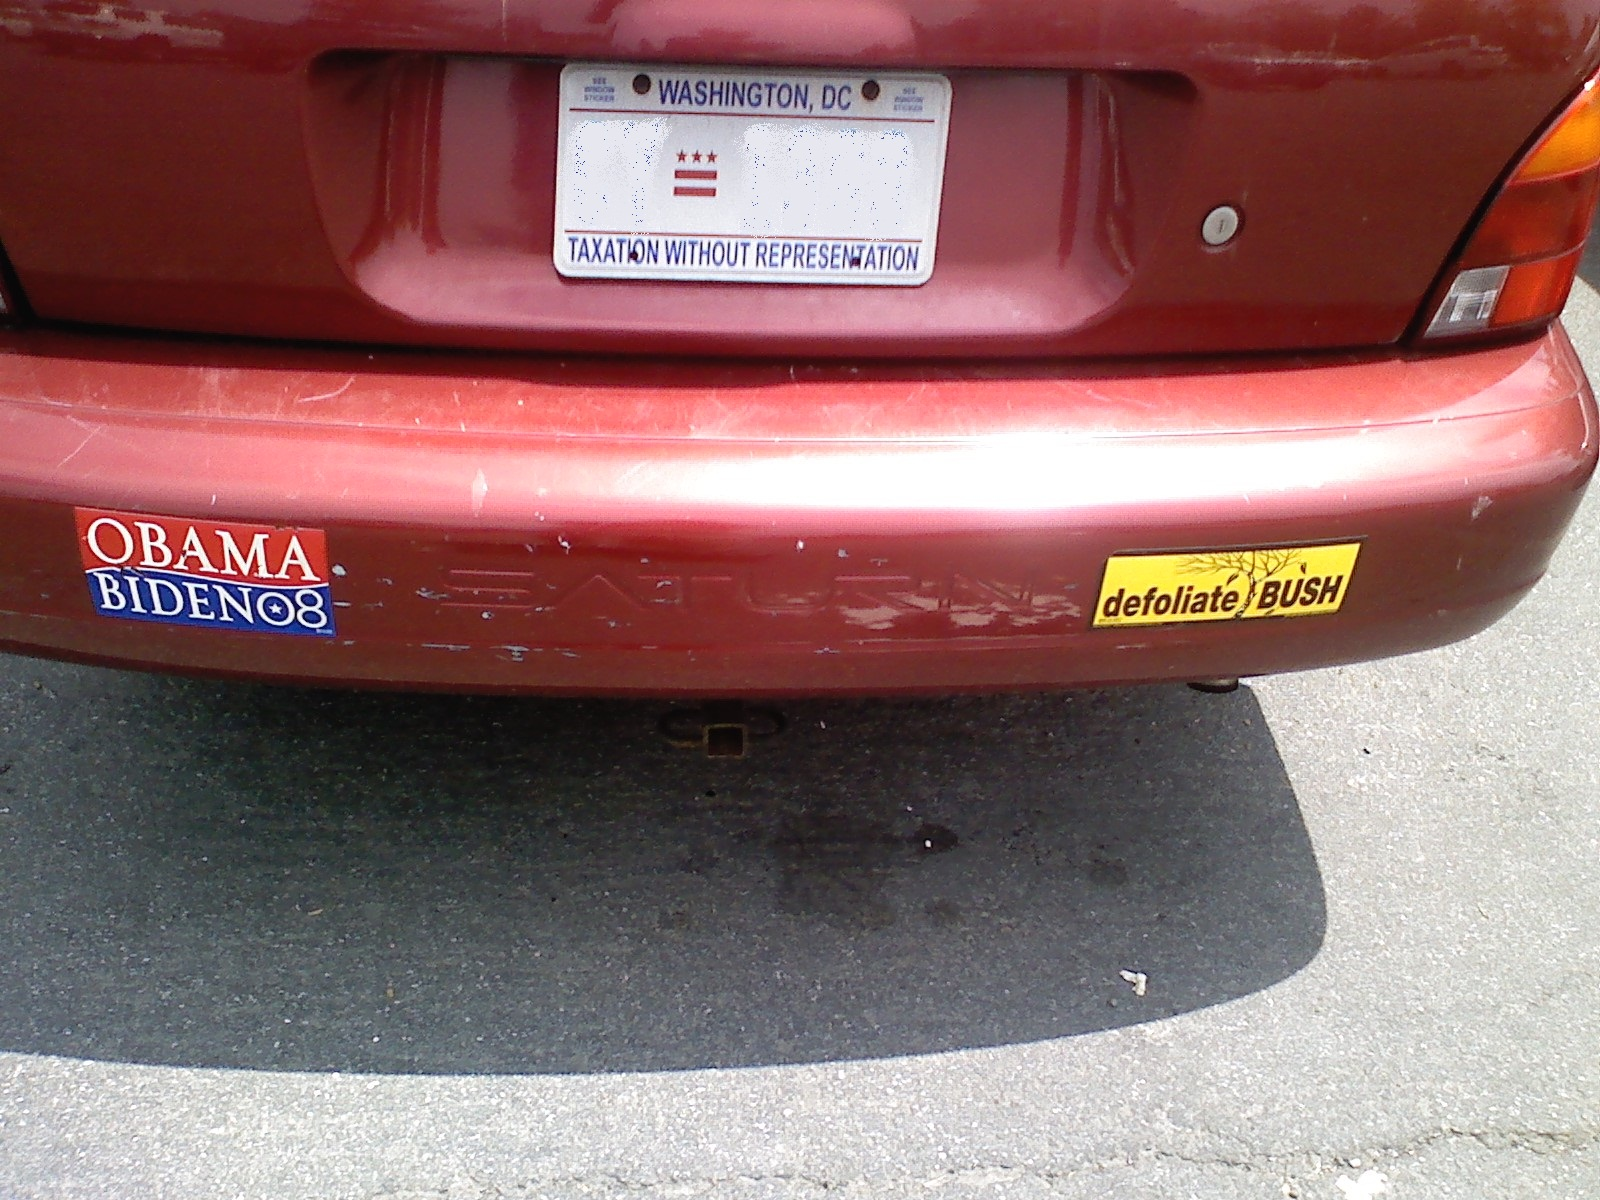 Hateful liberal bumper sticker of the day